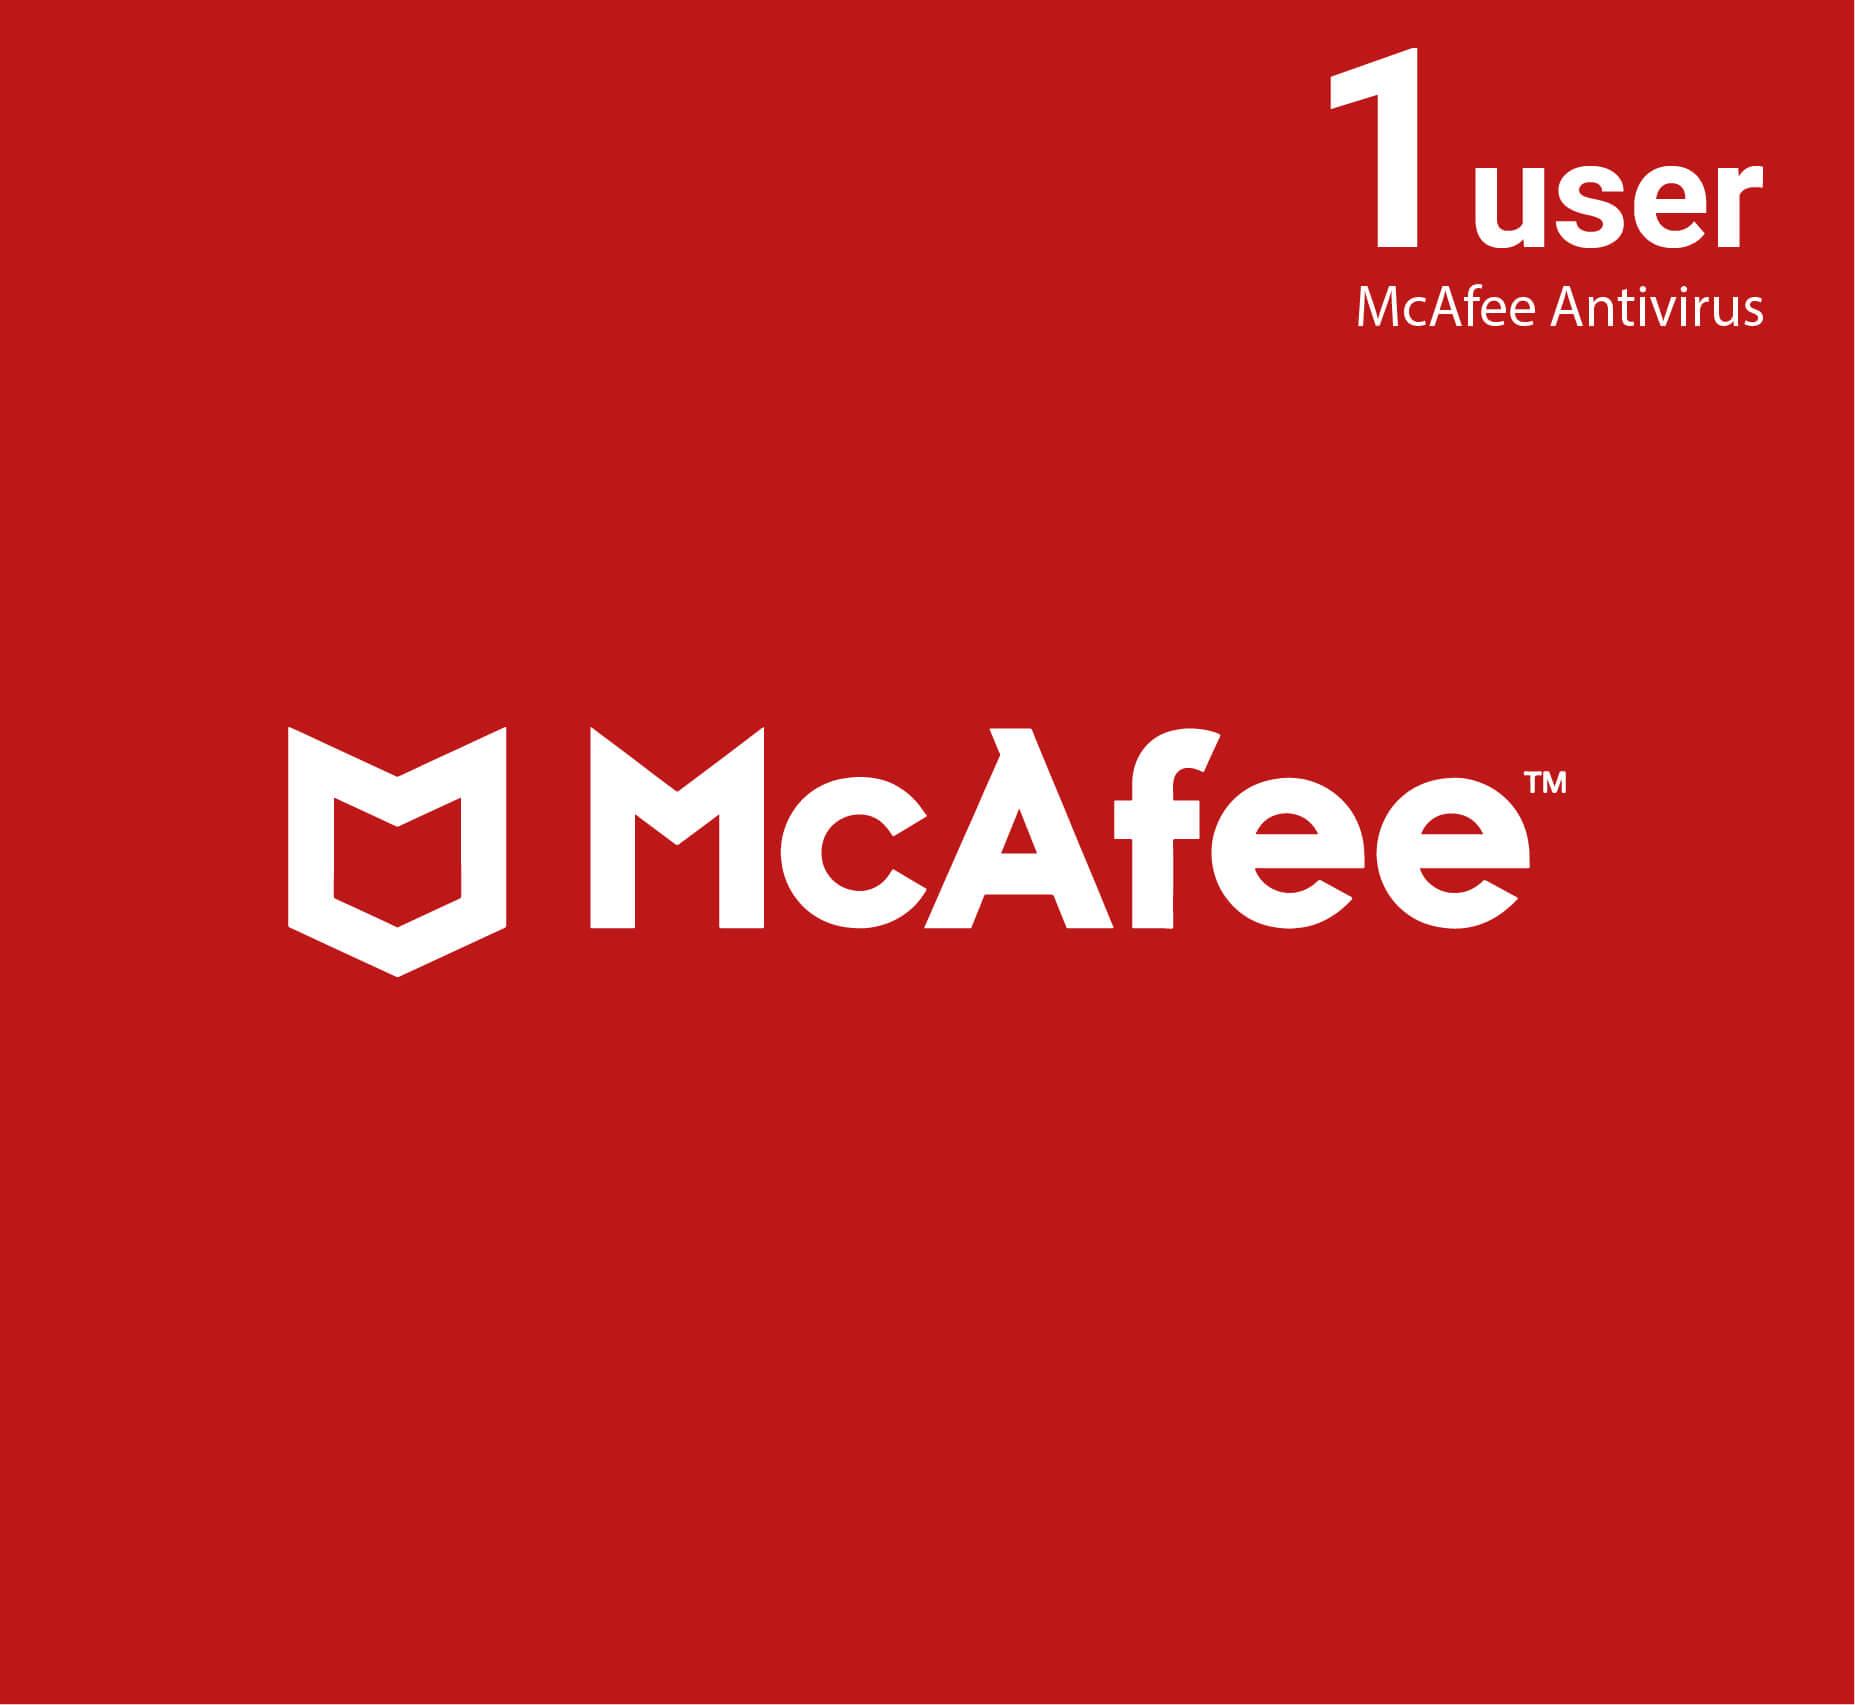 McAfee Antivirus 1 user